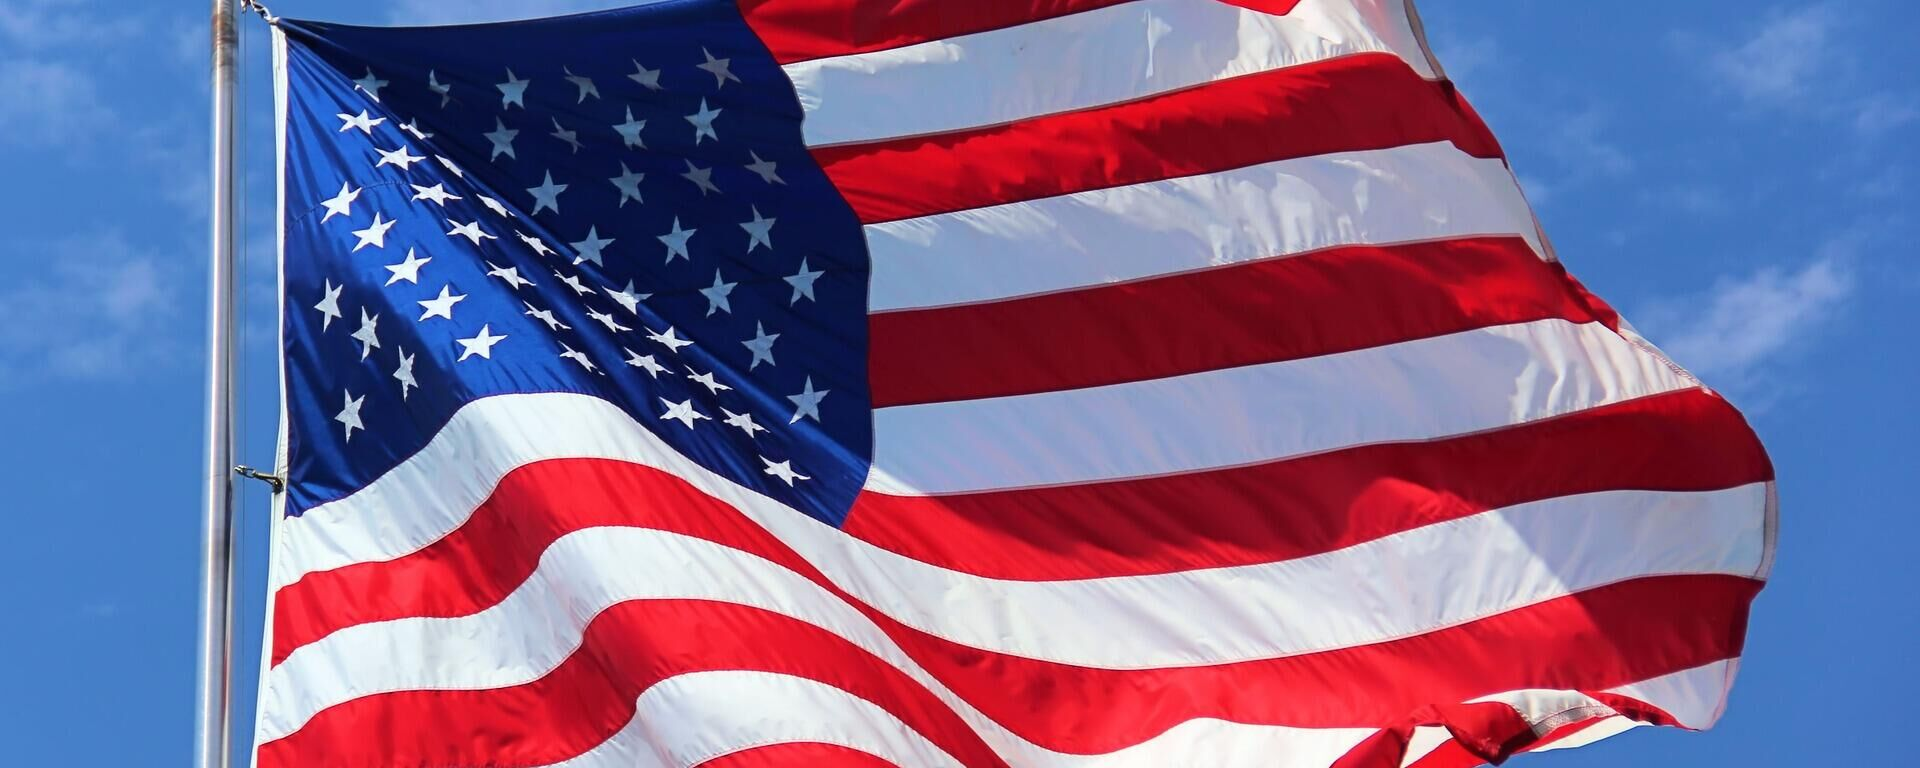 Flagge der USA - SNA, 1920, 24.09.2021